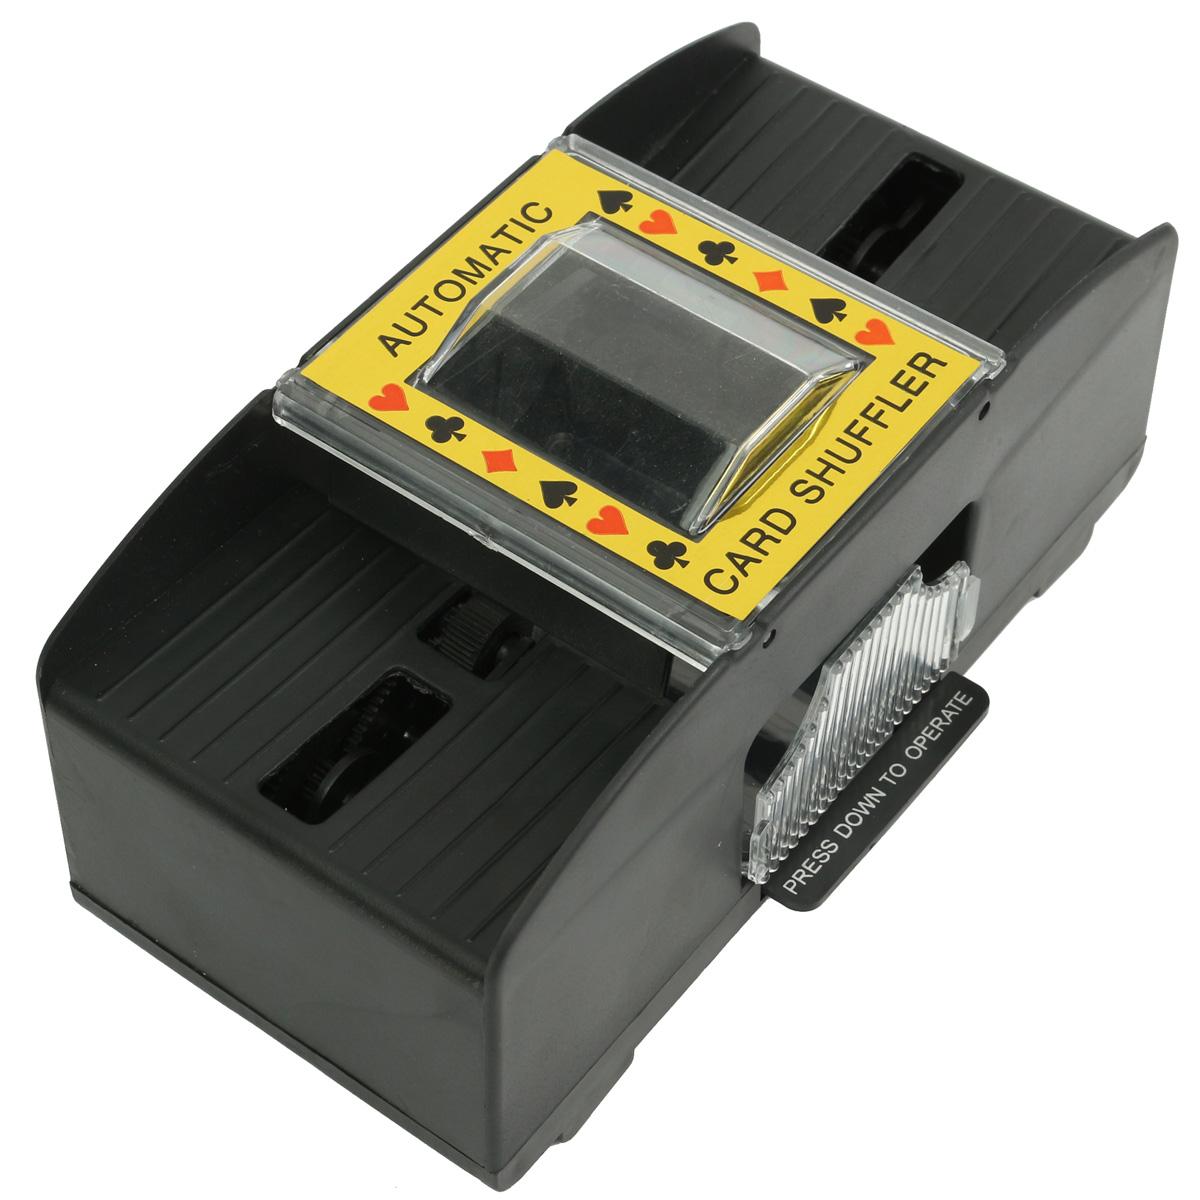 8 deck card shuffler casino automatic card shuffler